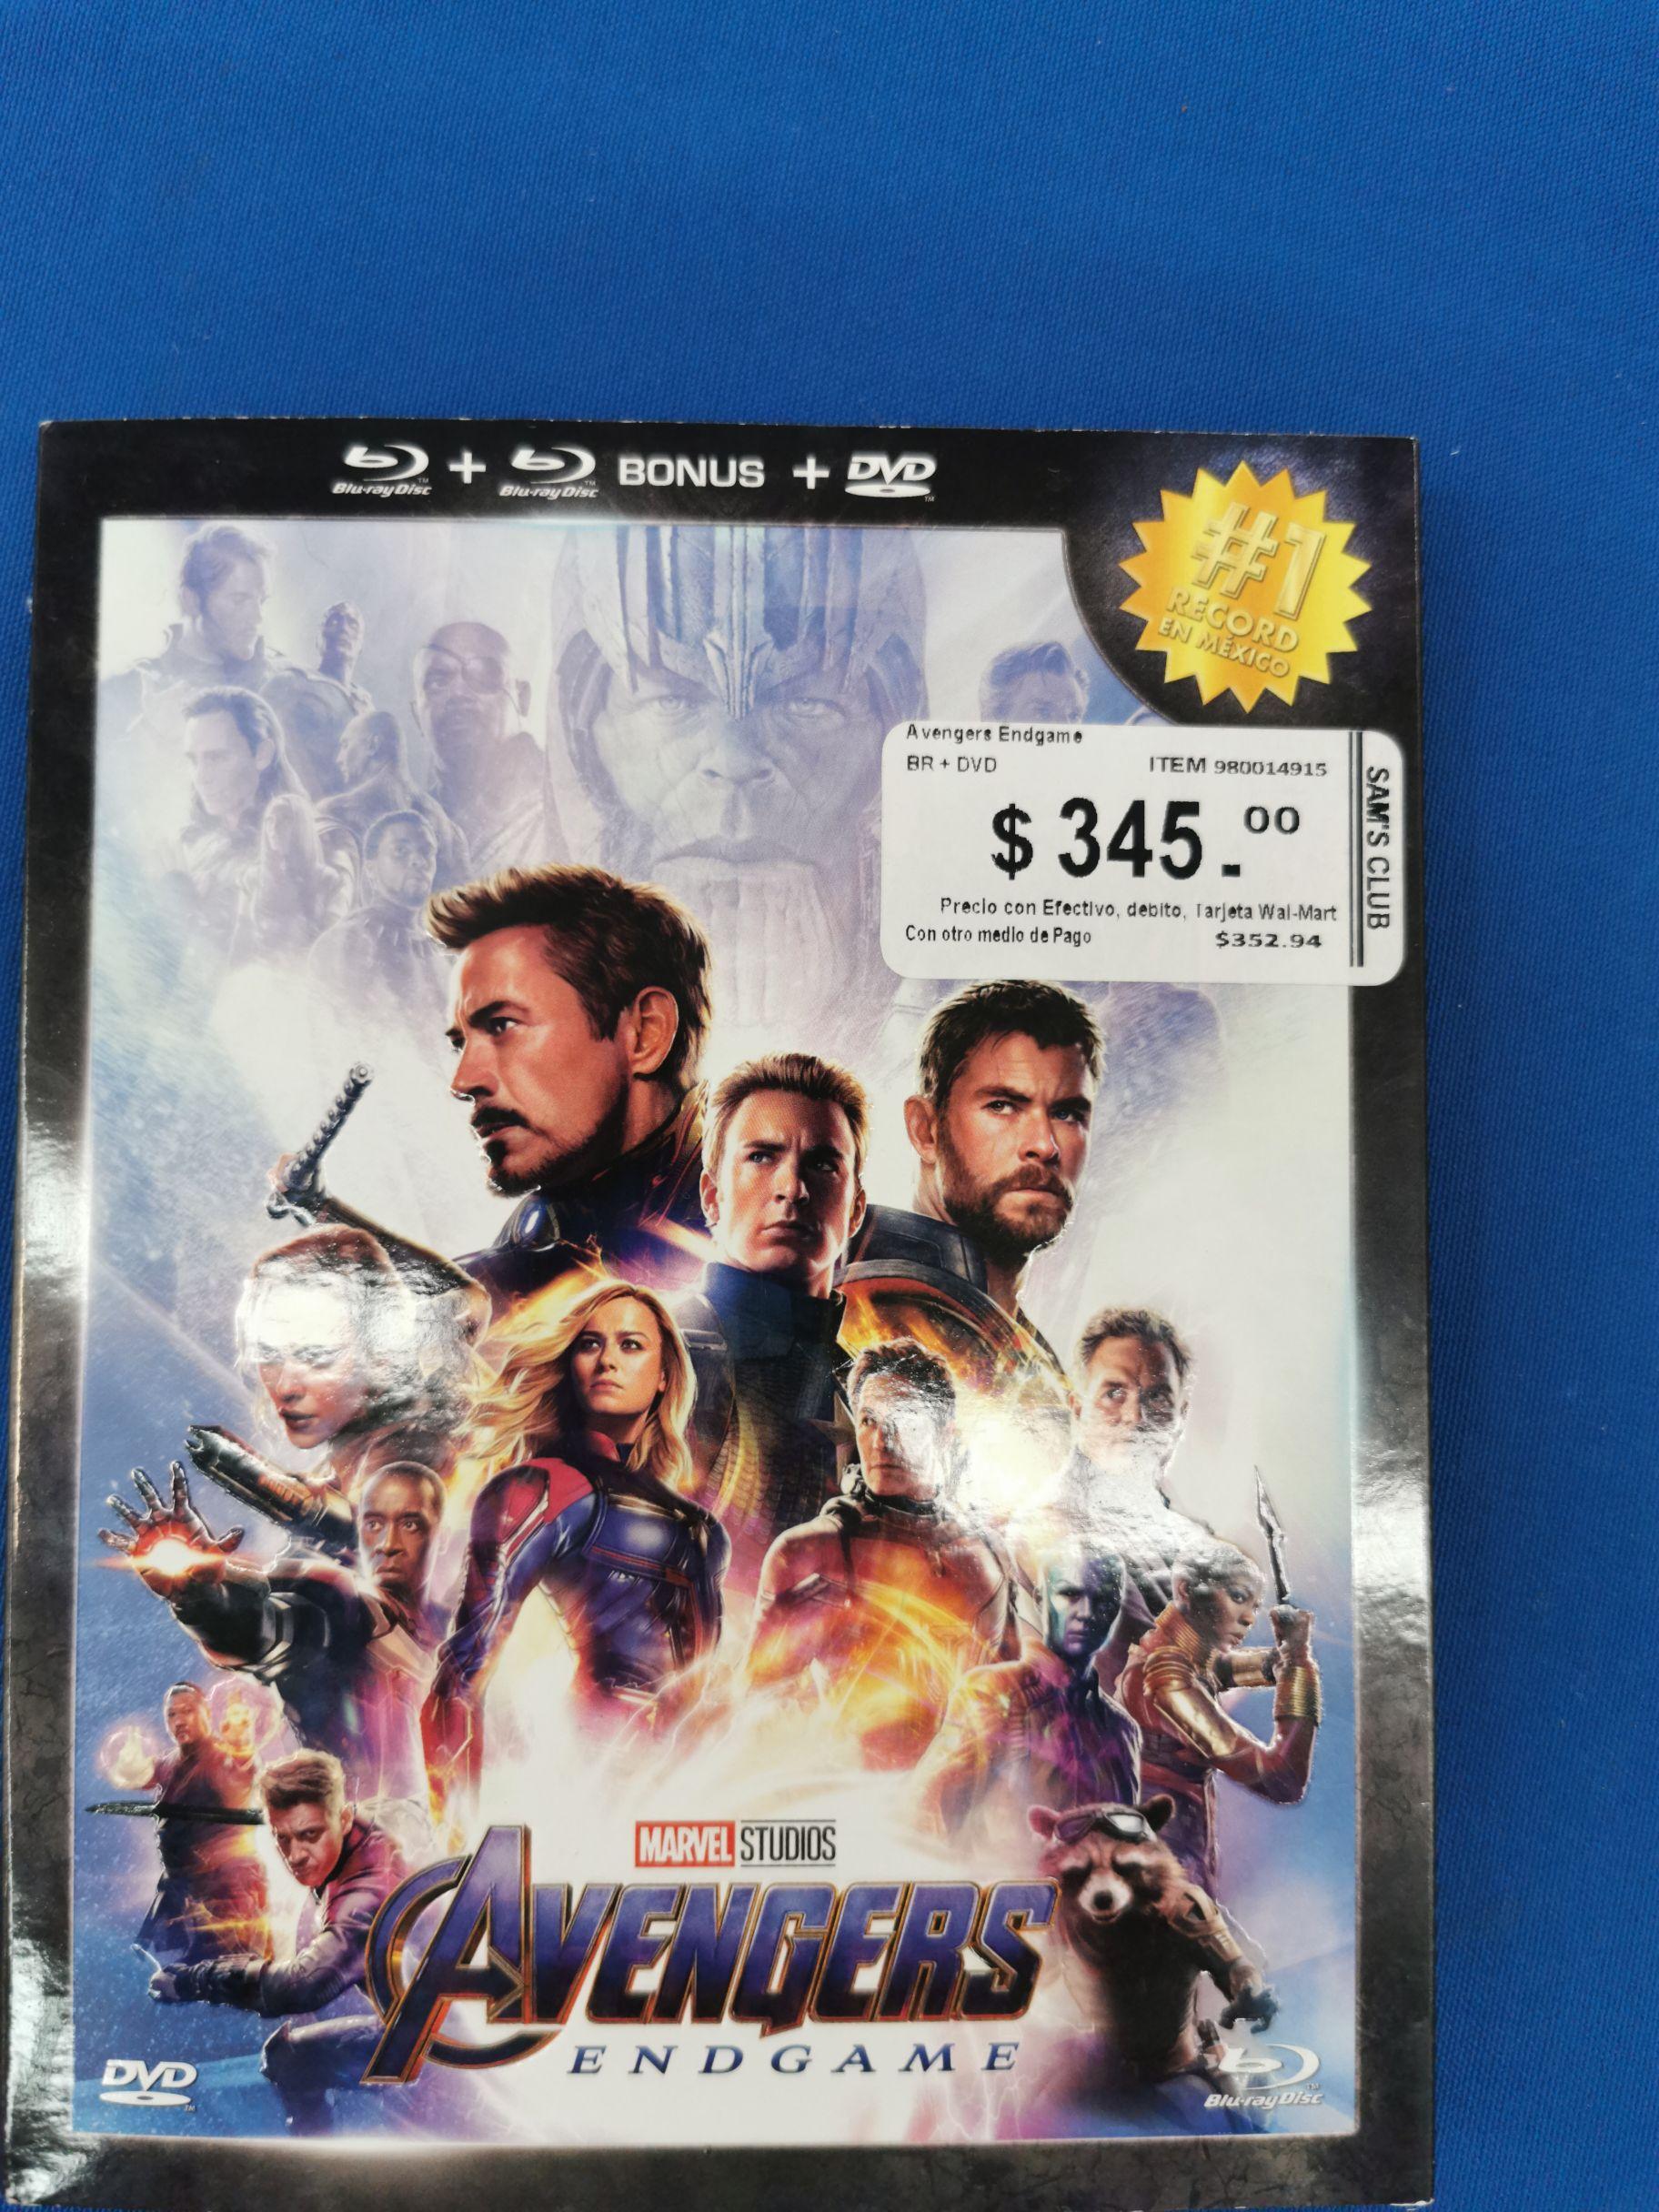 Sam's Club: Película Avengers EndGame 4K extendida